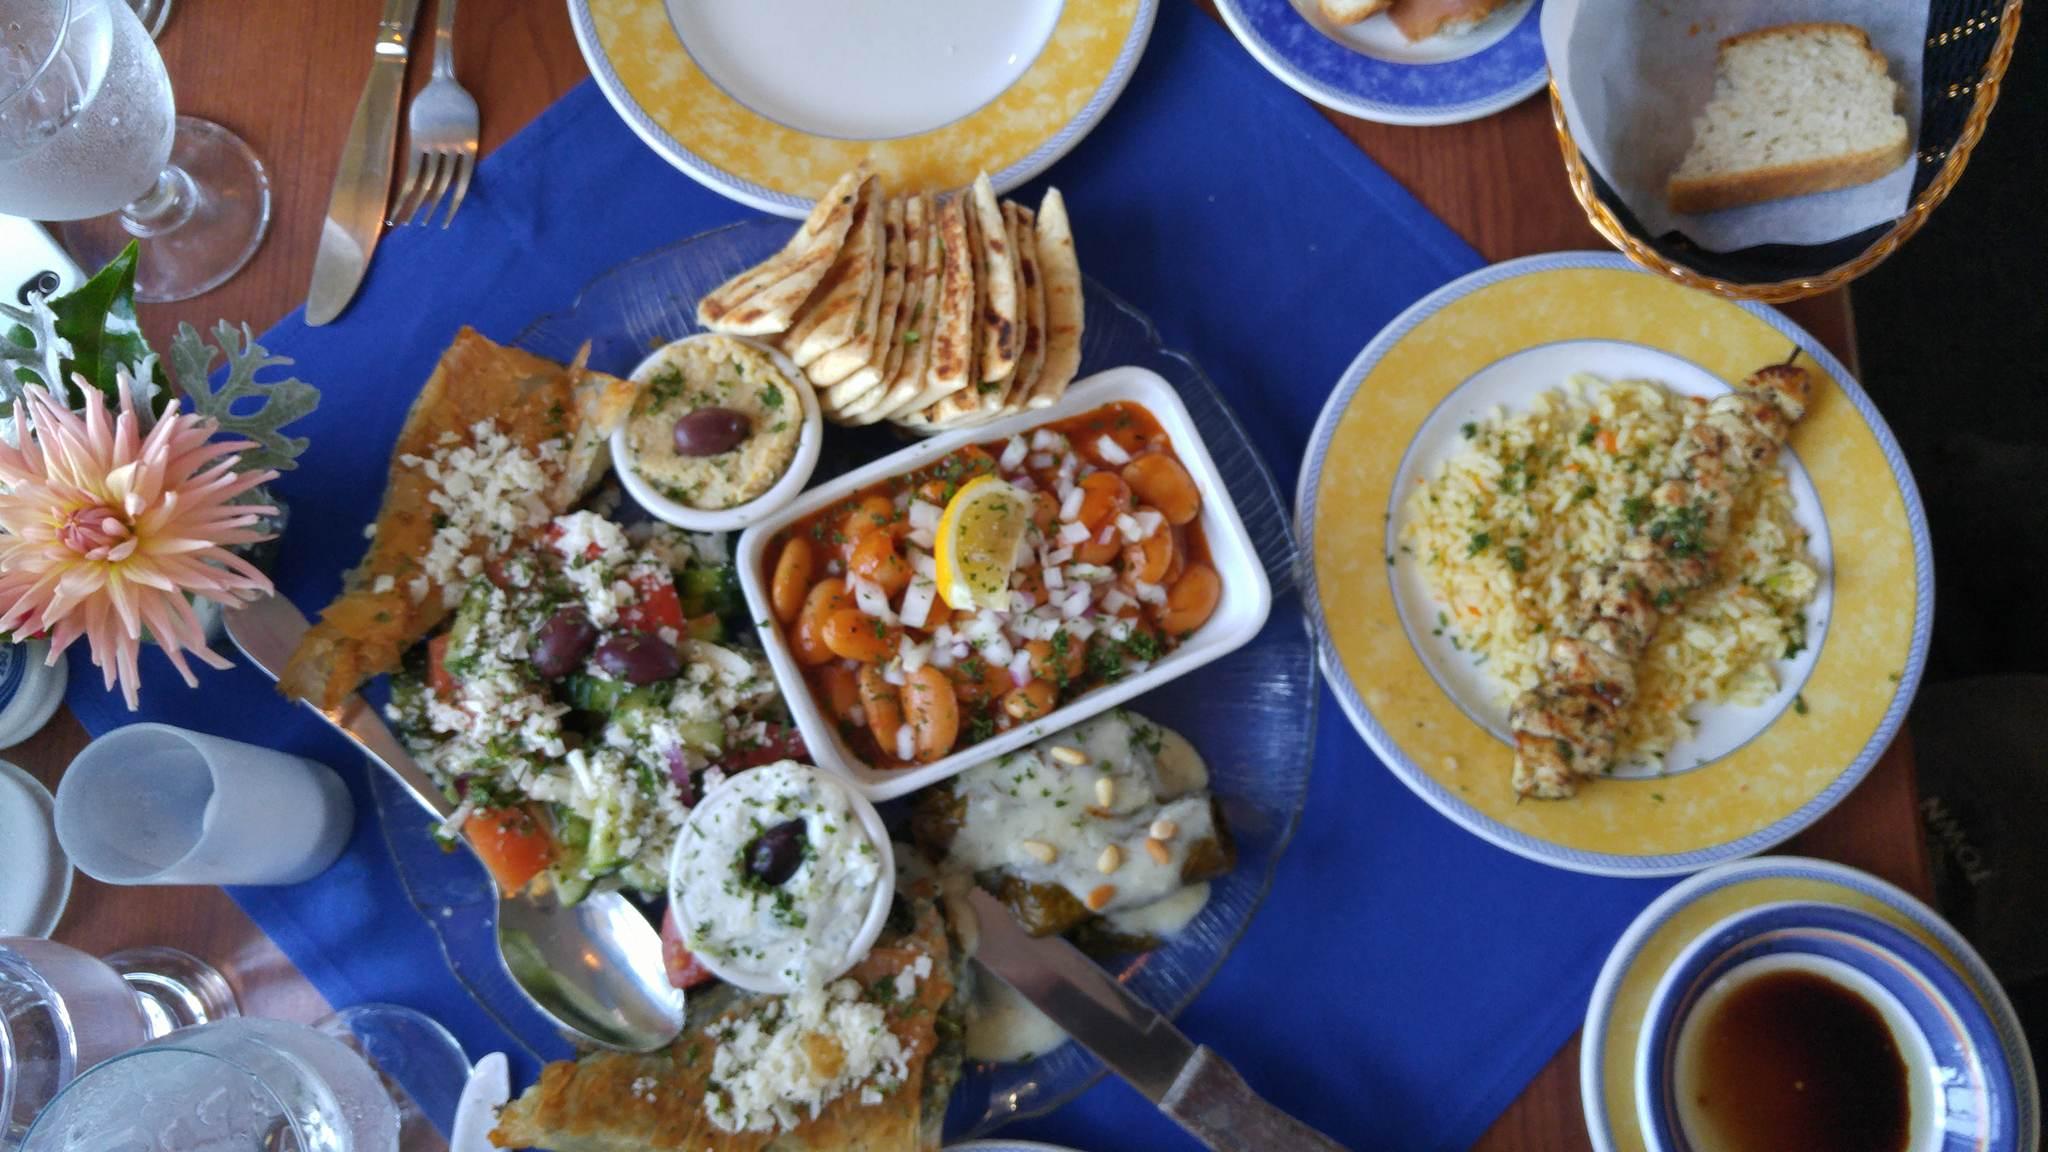 Vegetarian platter at Ithaka Restaurant, Victoria BC.